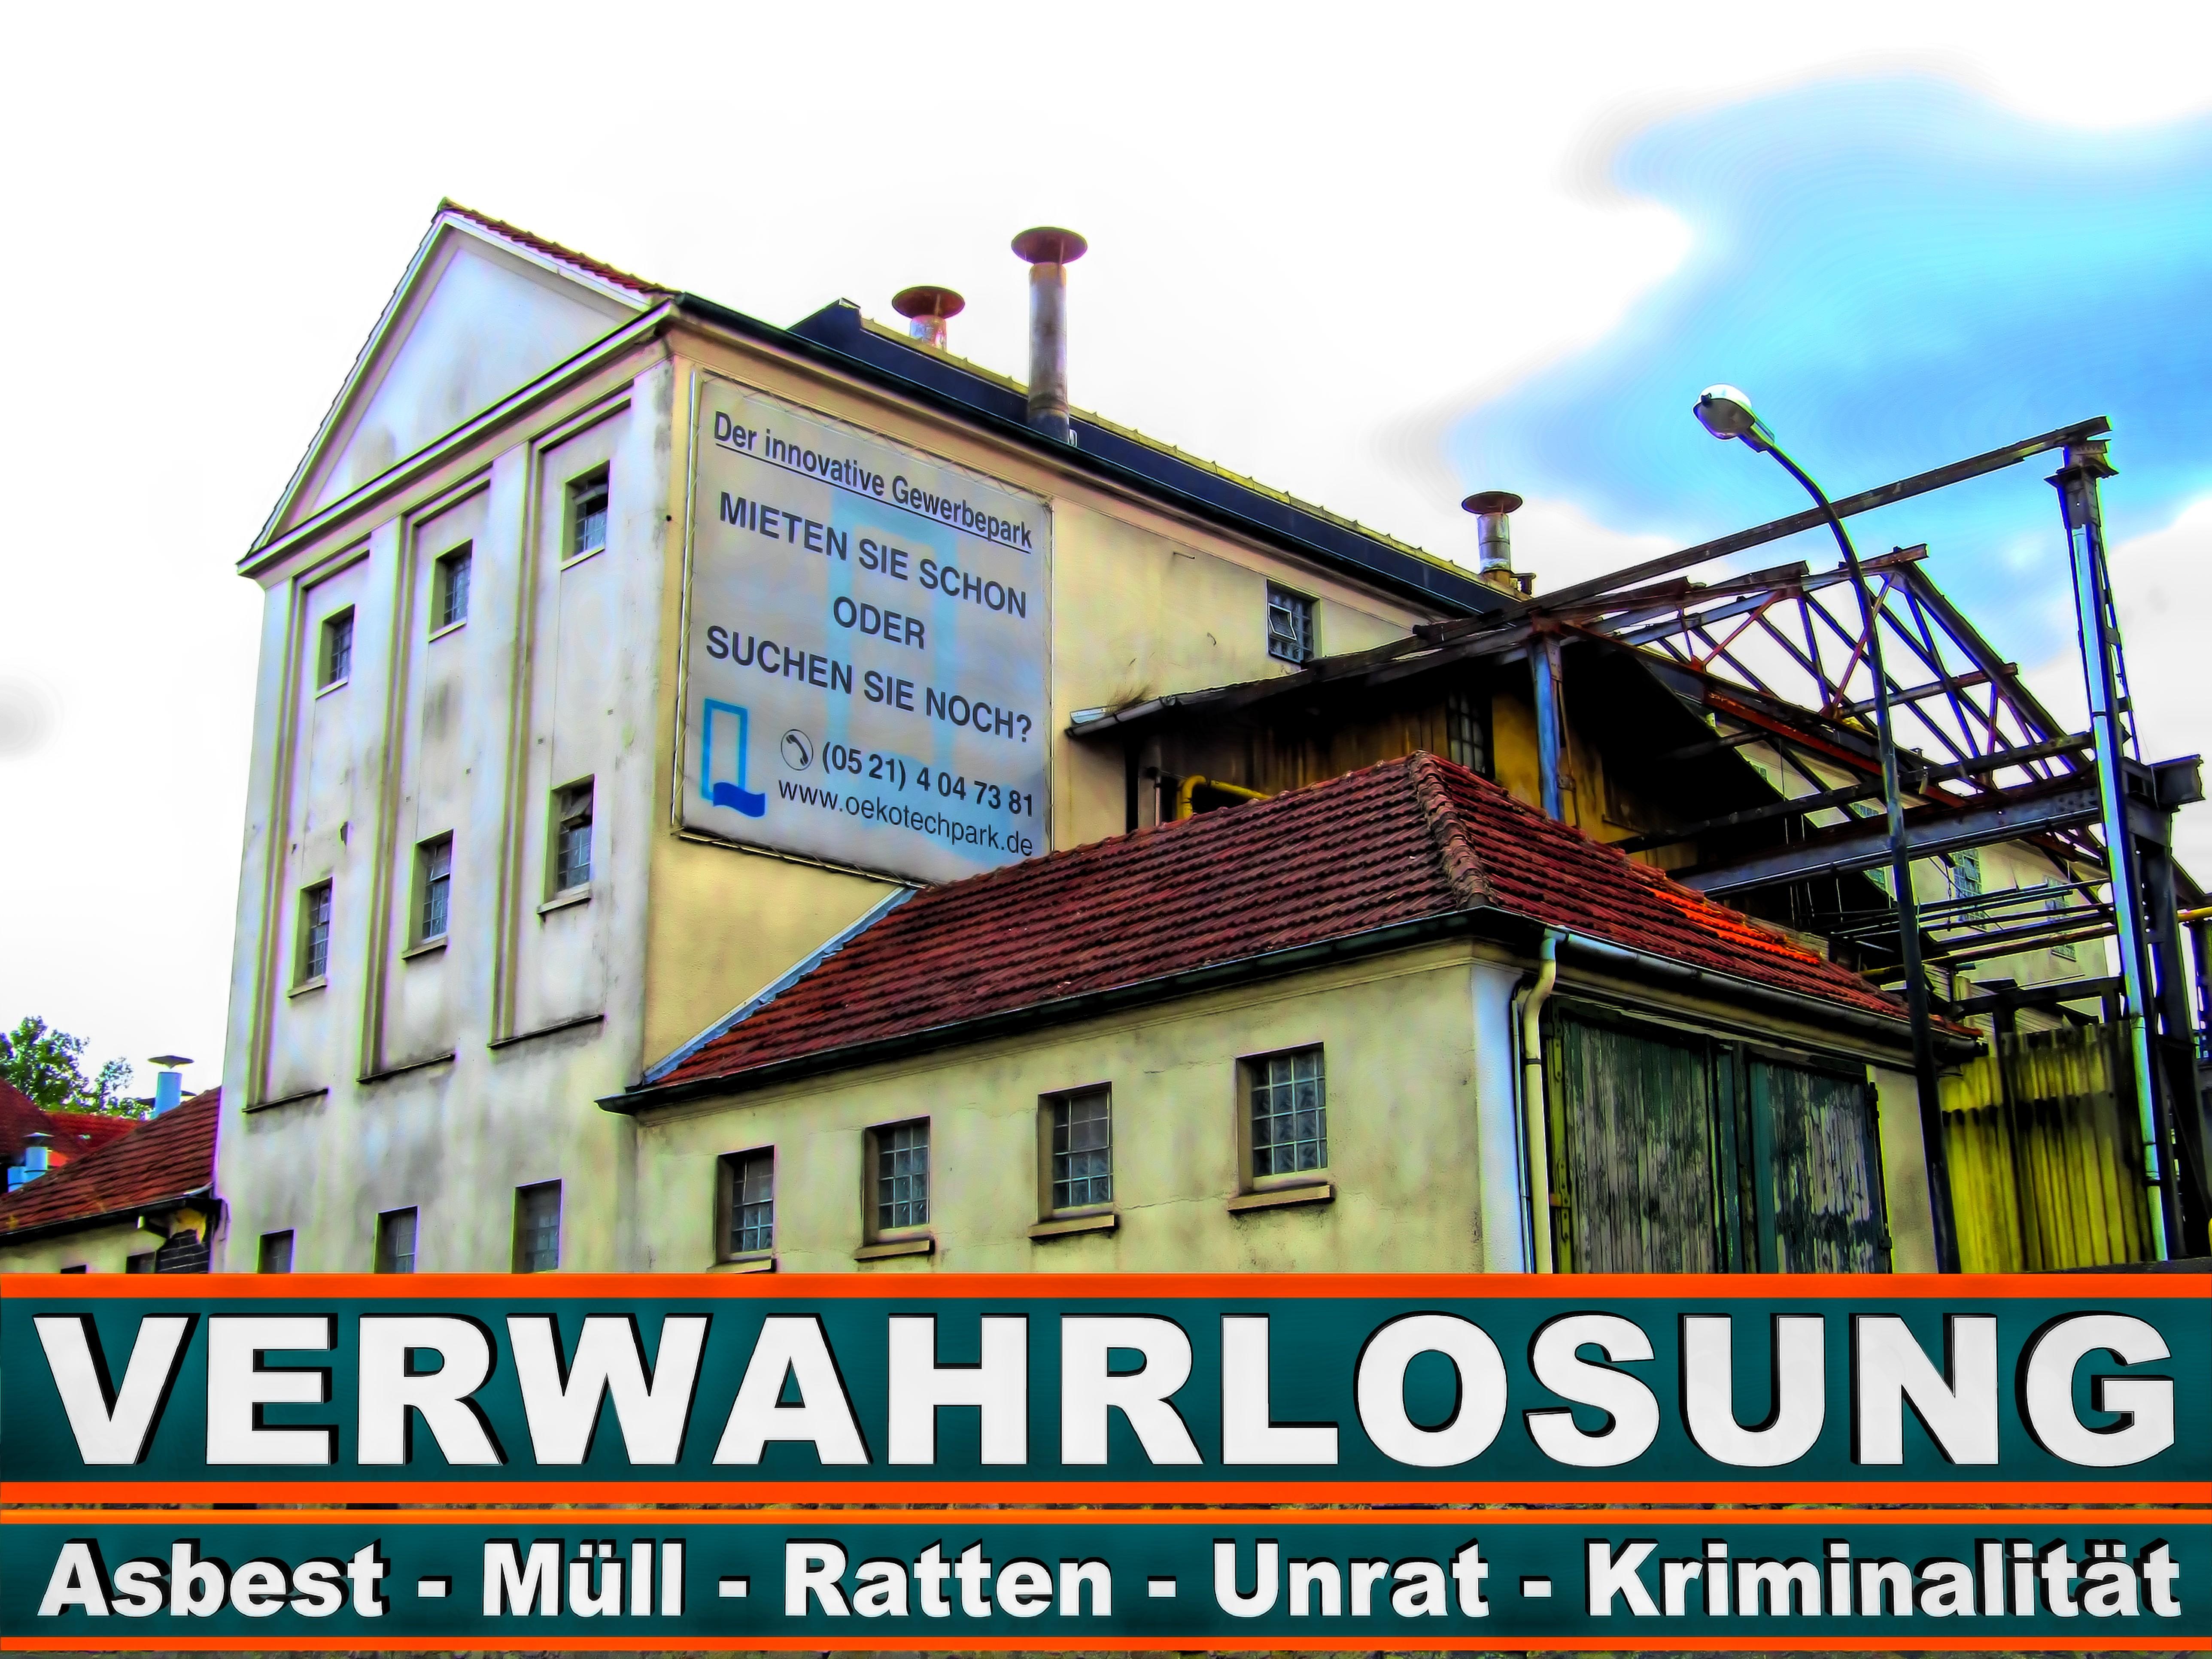 ÖKO TECH PARK BIELEFELD KÜNKCÜ STEEL ISMAIL KüNKCü KRACKSER STR 12 029